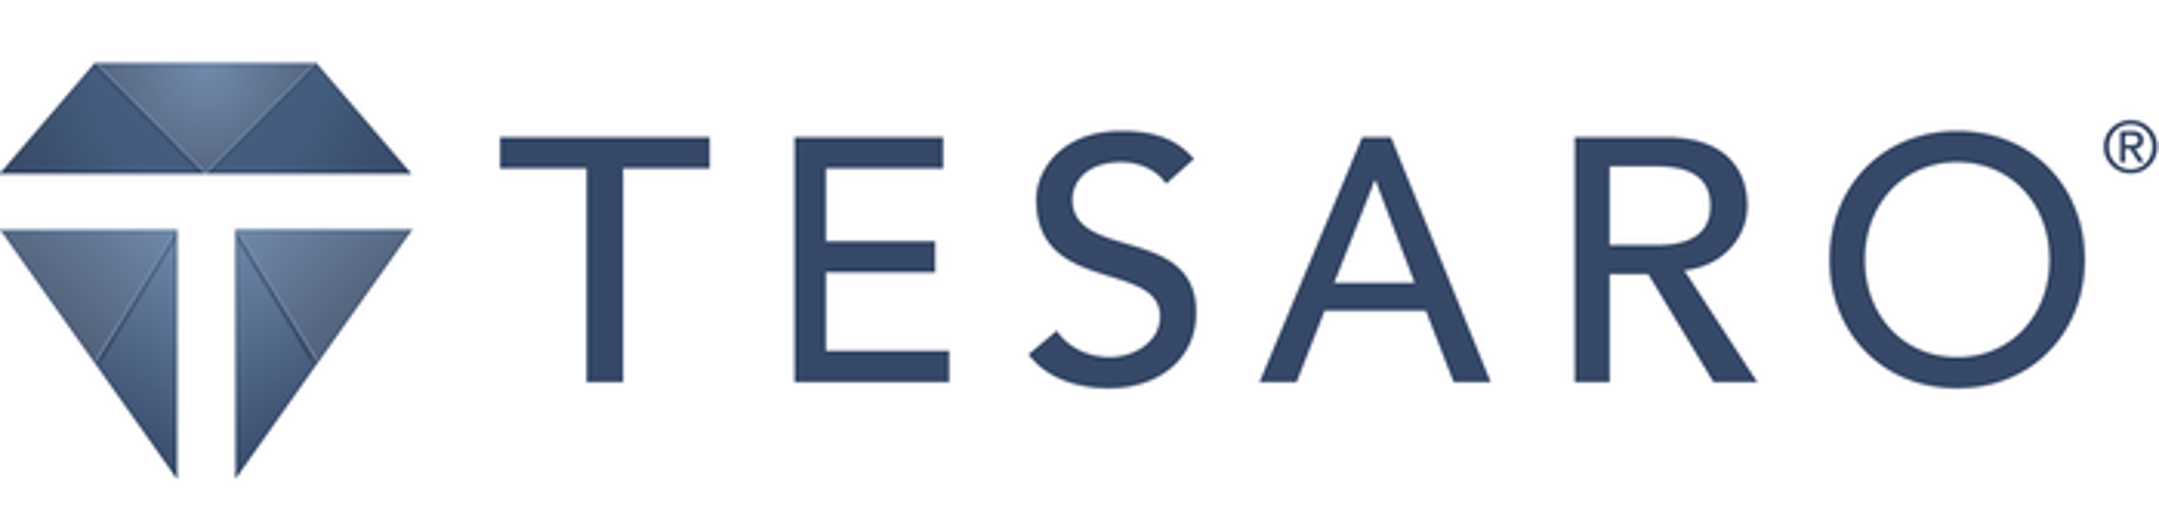 Tesaro corporate logo.